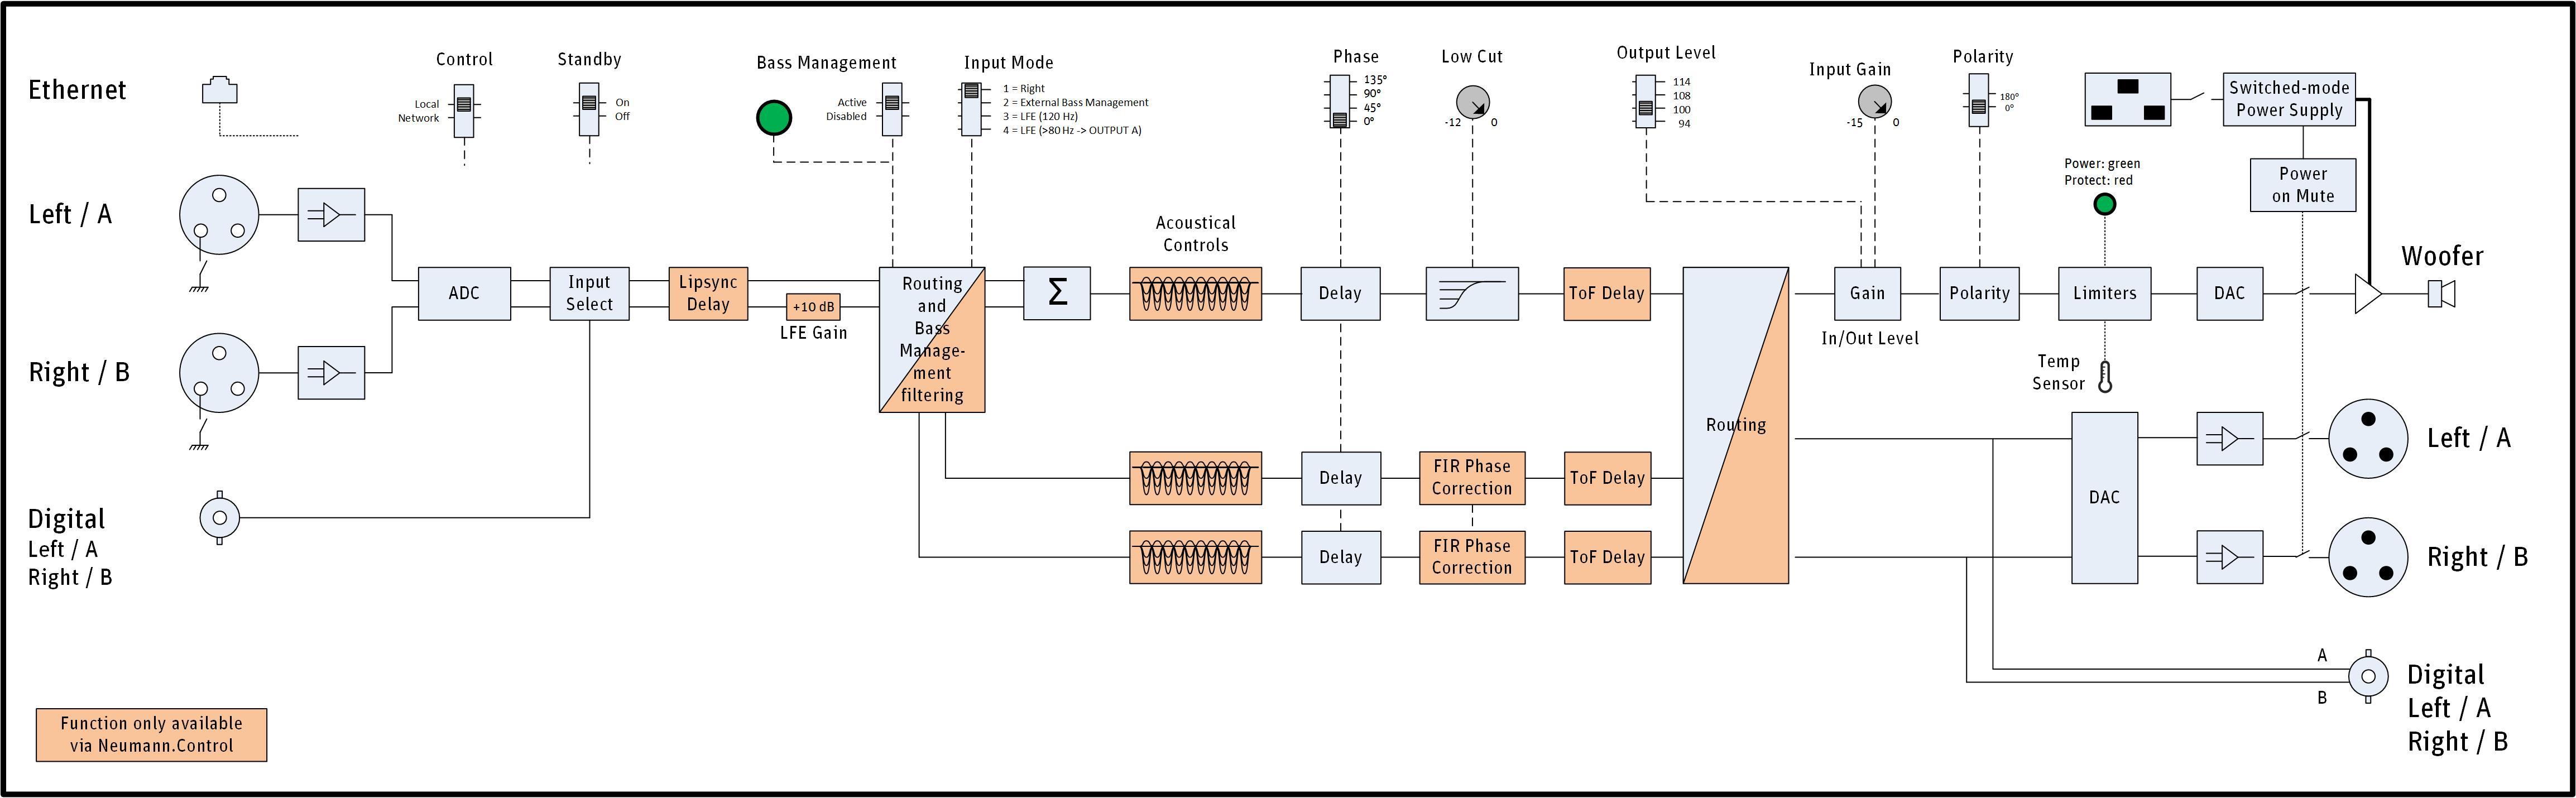 KH-750-DSP_Block-Diagram-Detailed.jpg